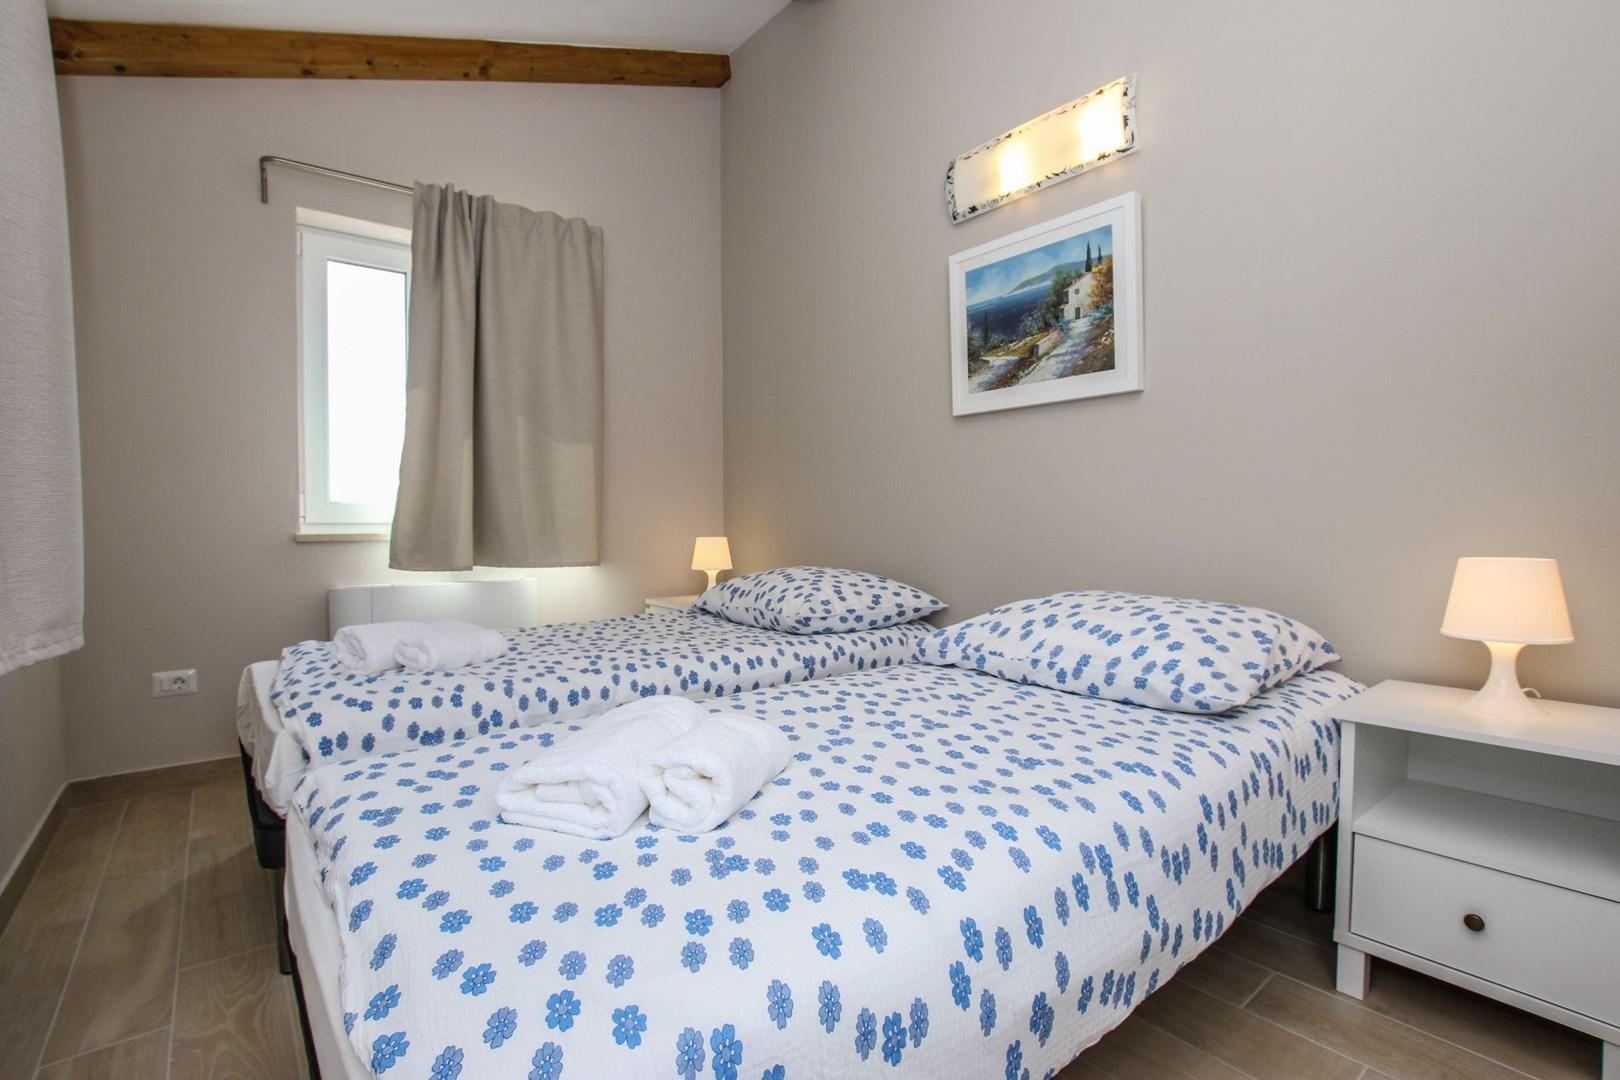 Ferienhaus Villa Cecilia mit privatem Pool in der Nähe von Aquacolors (2240240), Mugeba, , Istrien, Kroatien, Bild 15